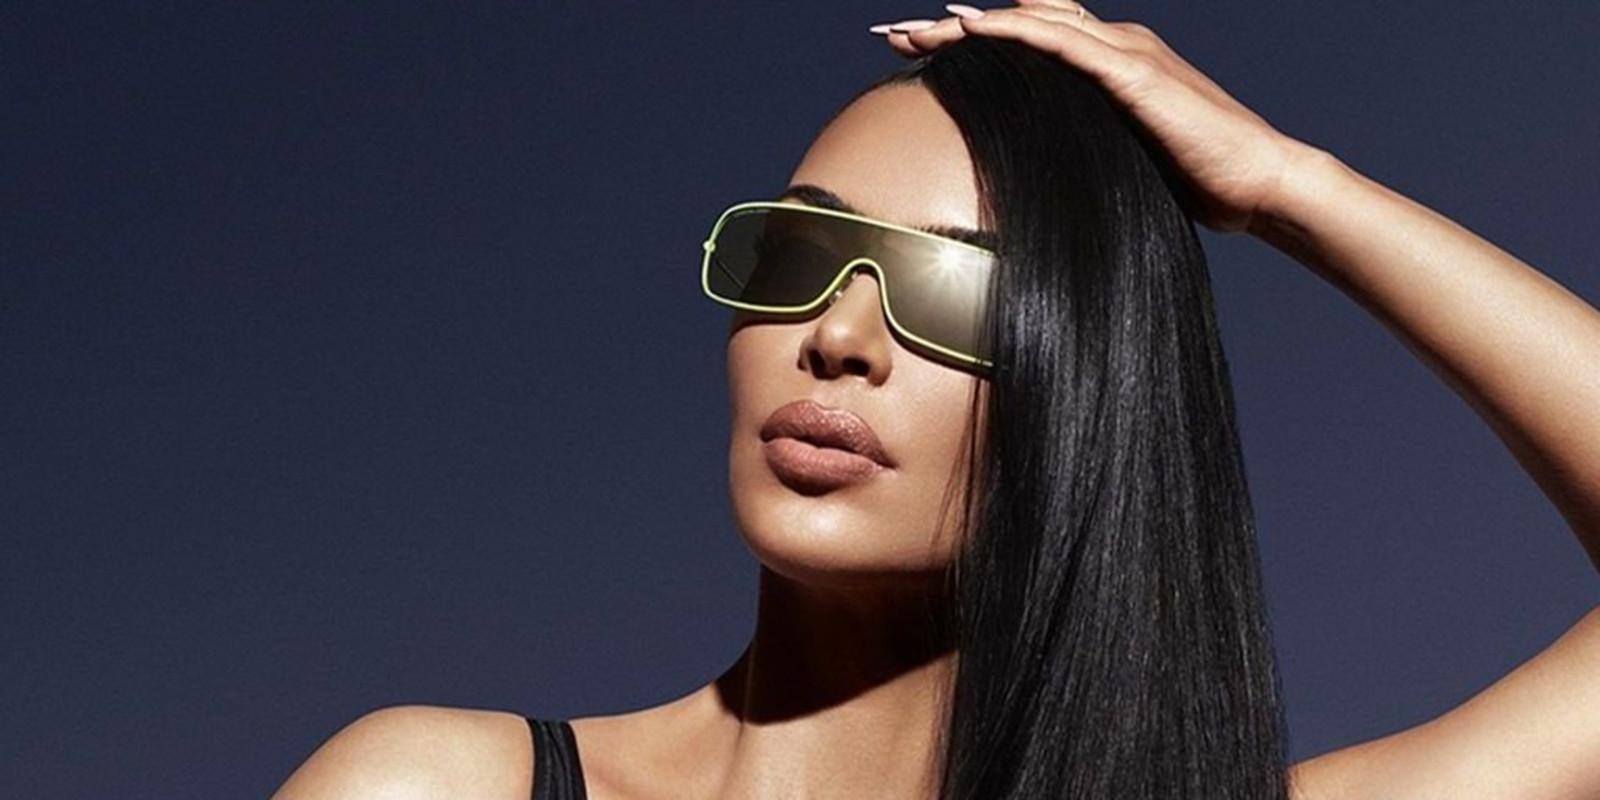 Kim Kardashian in de campagne van Carolina Lemke.